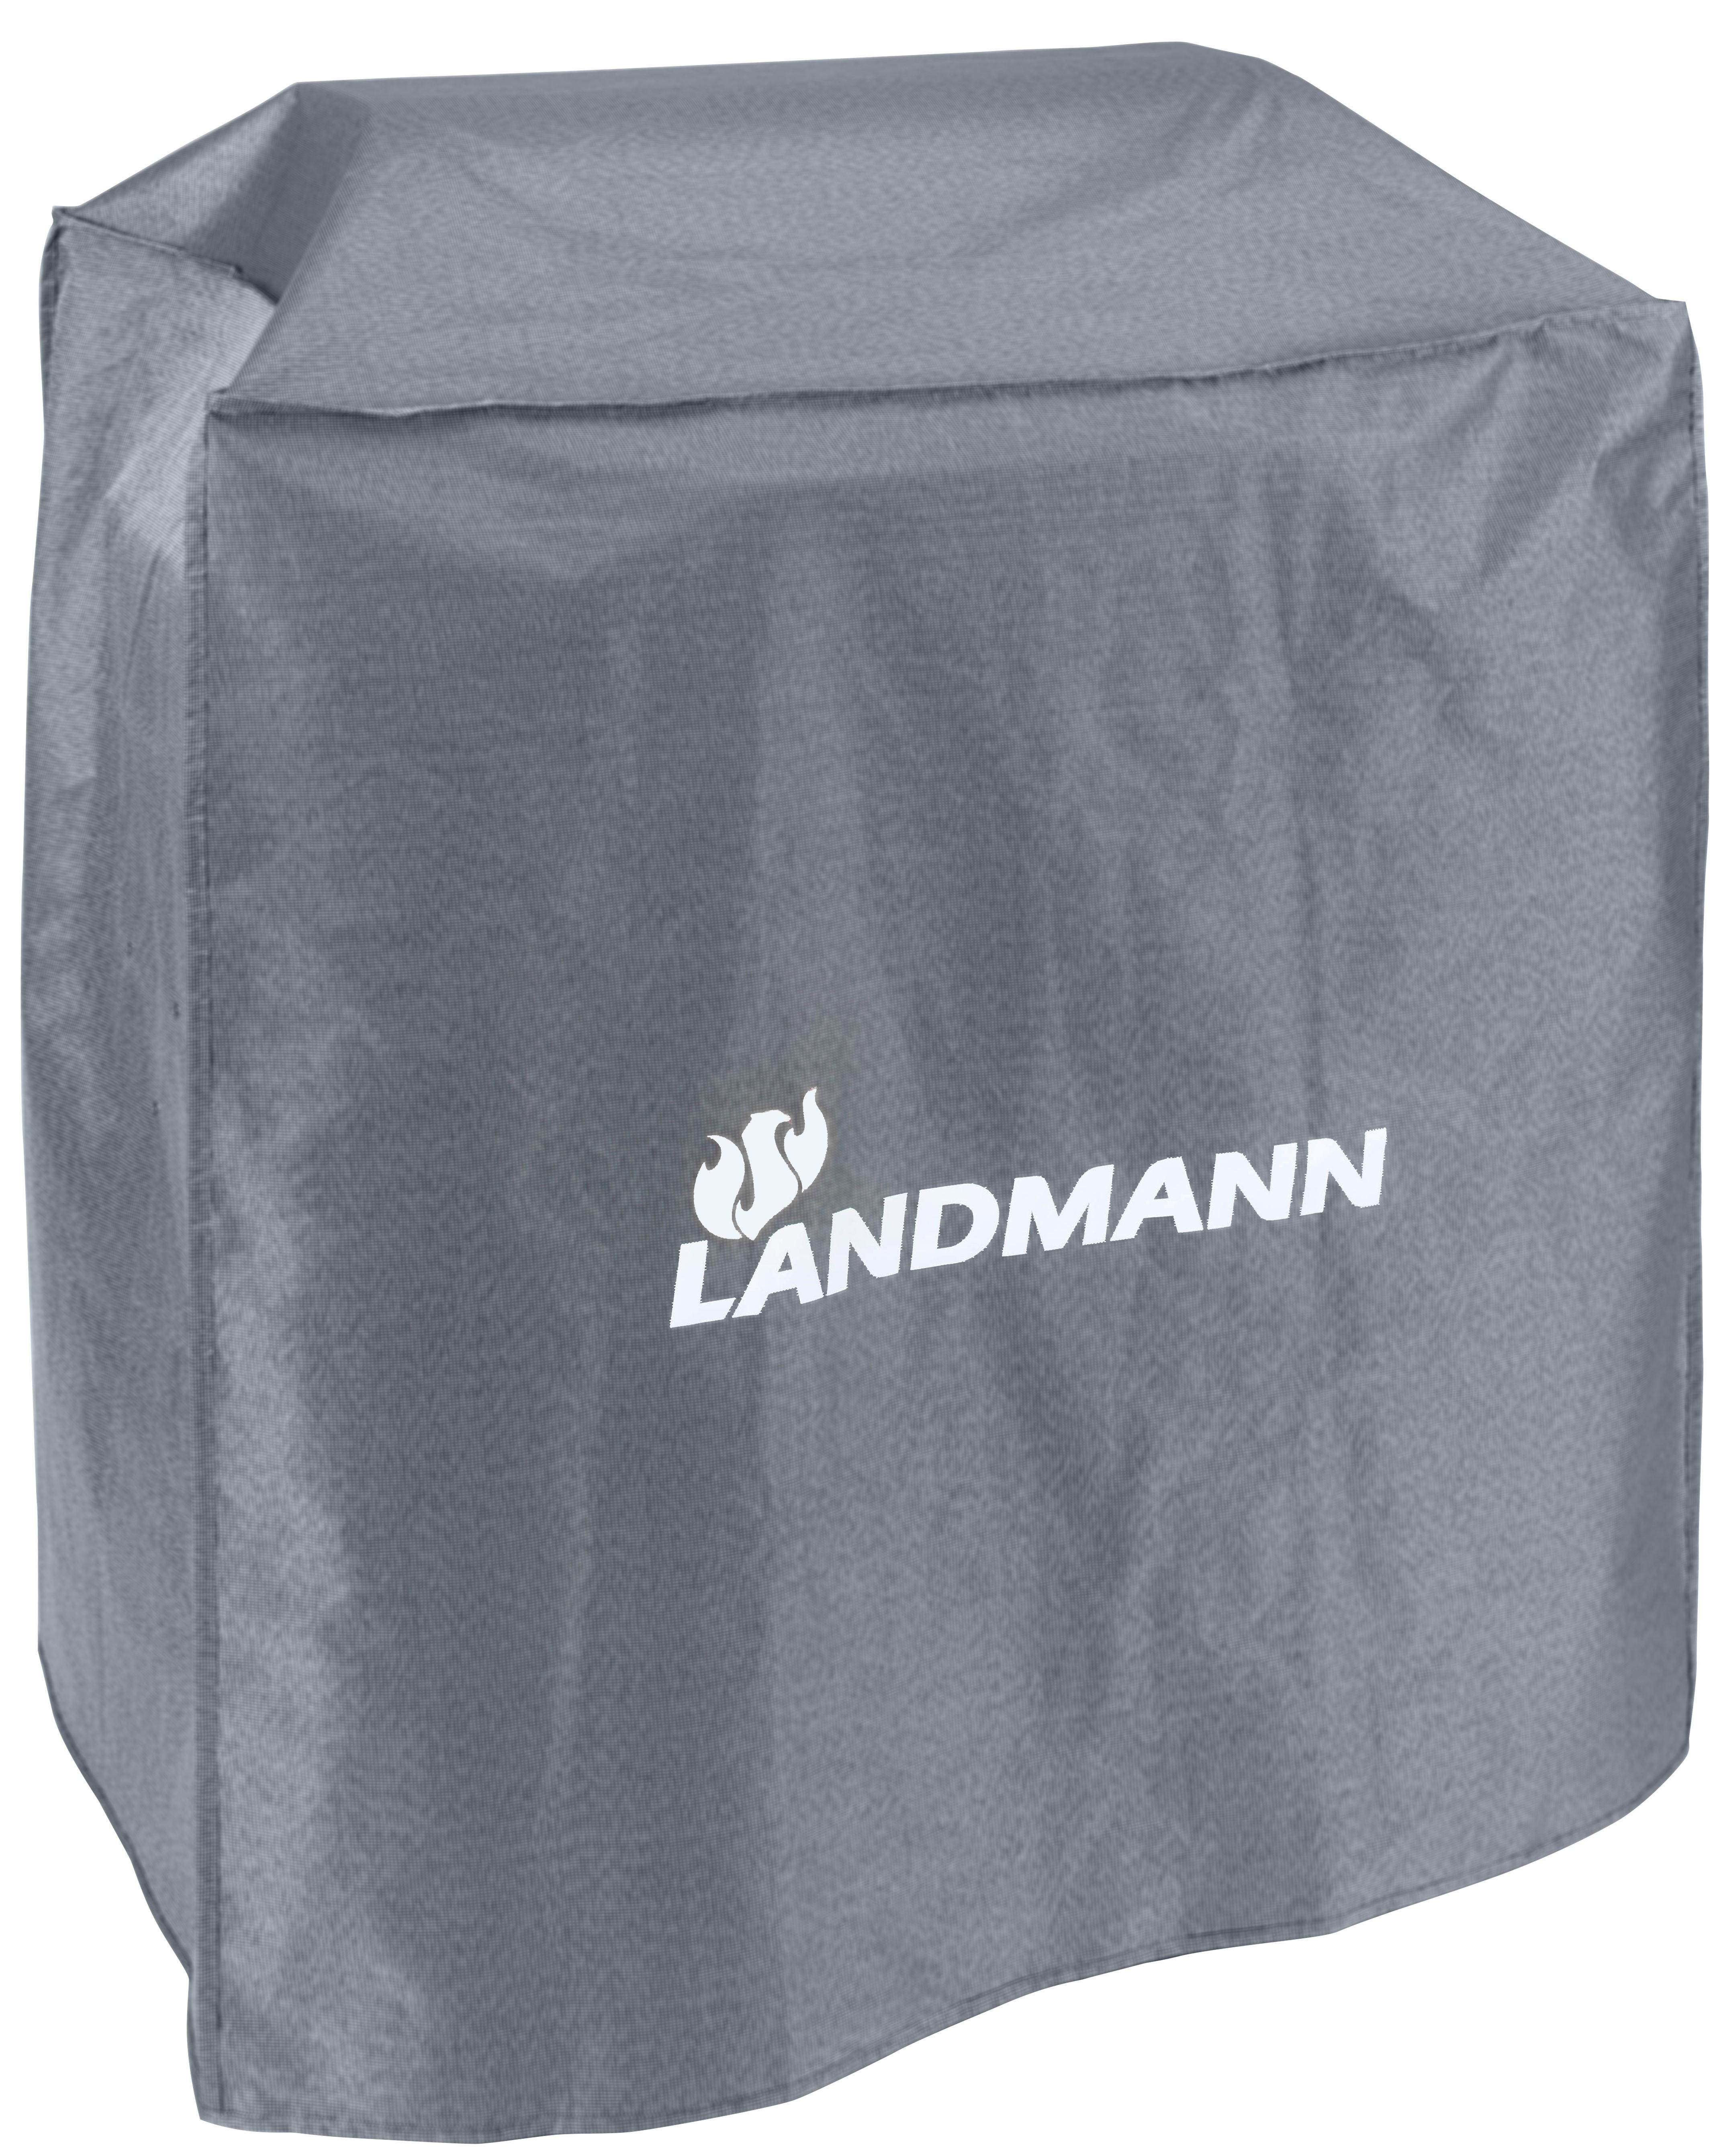 Landmann Premium ochranný obal na gril L 15706